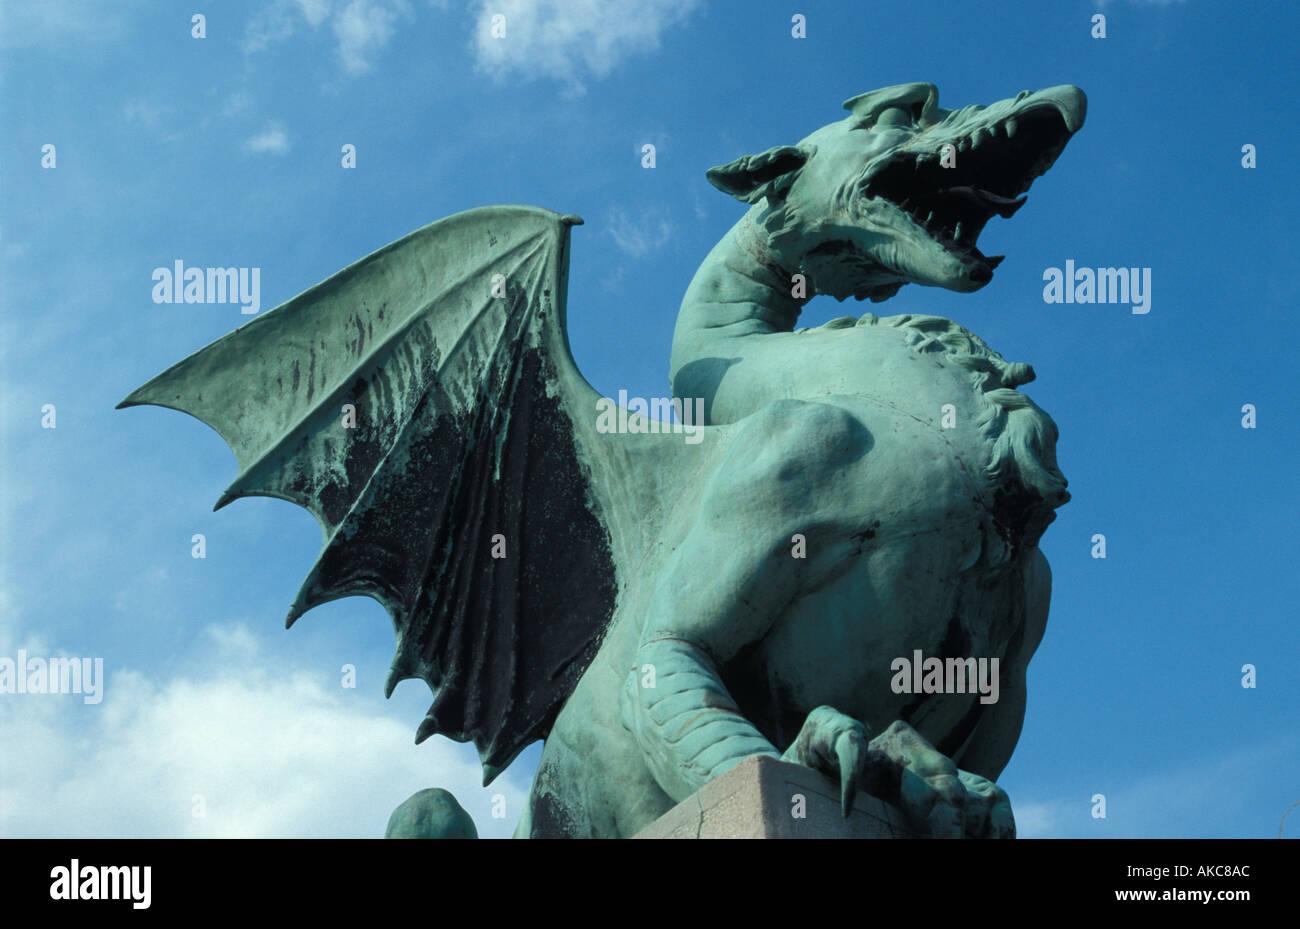 Ljubljana, dragon statue - Stock Image